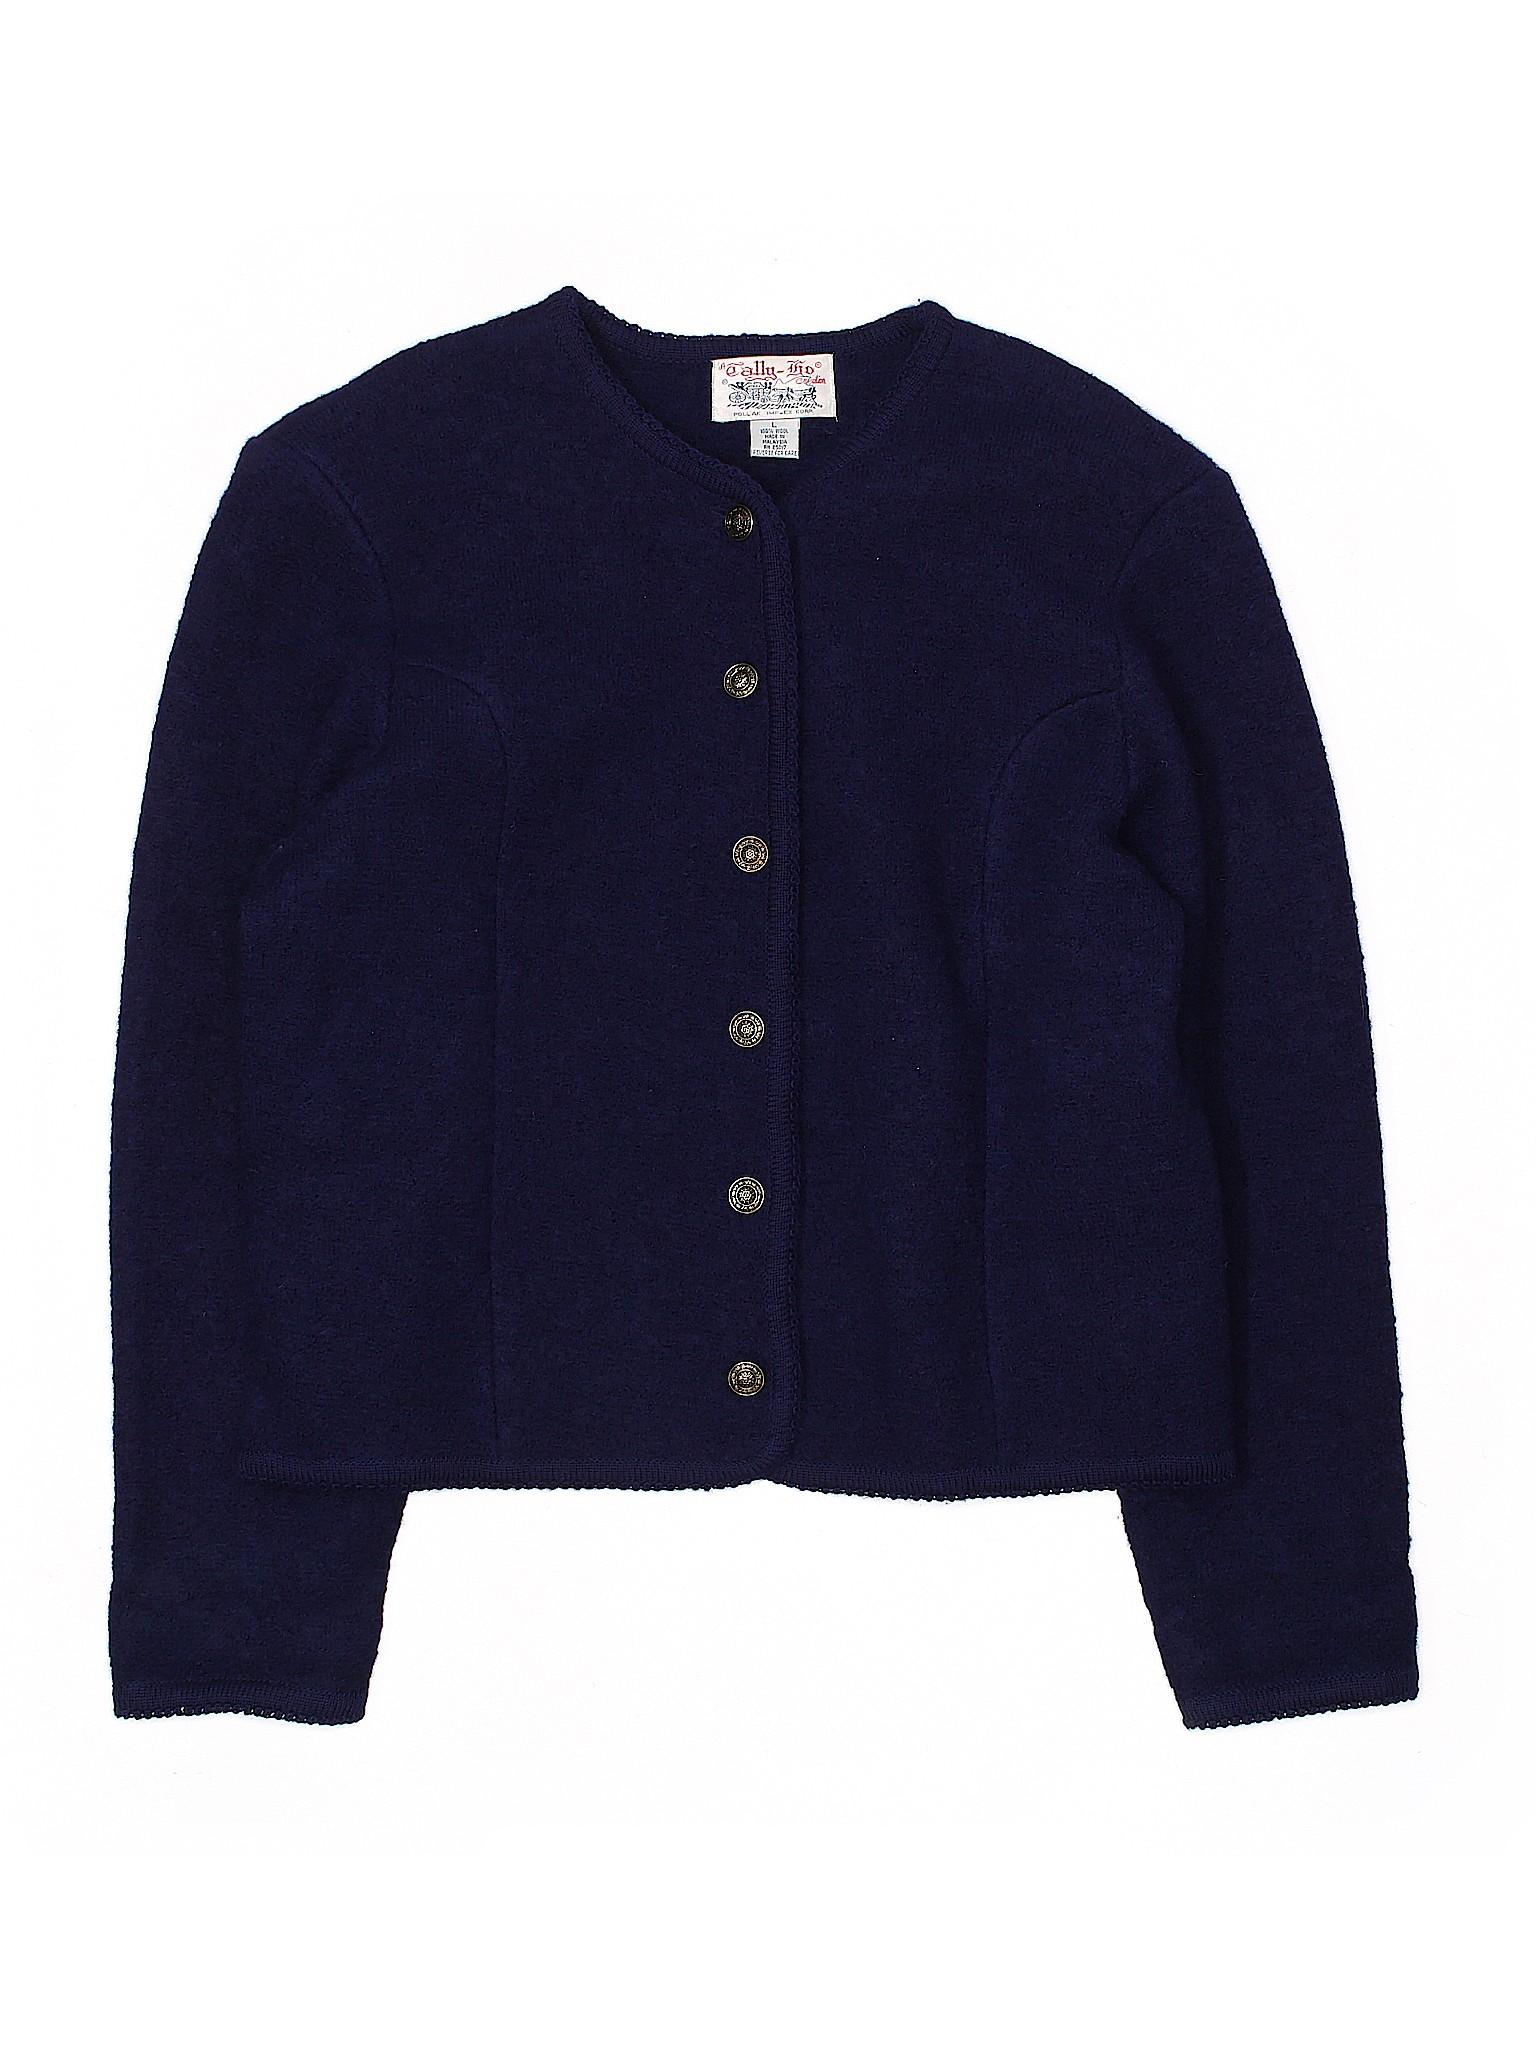 Boutique Wool Blazer leisure Tally Ho qPPx8F41w